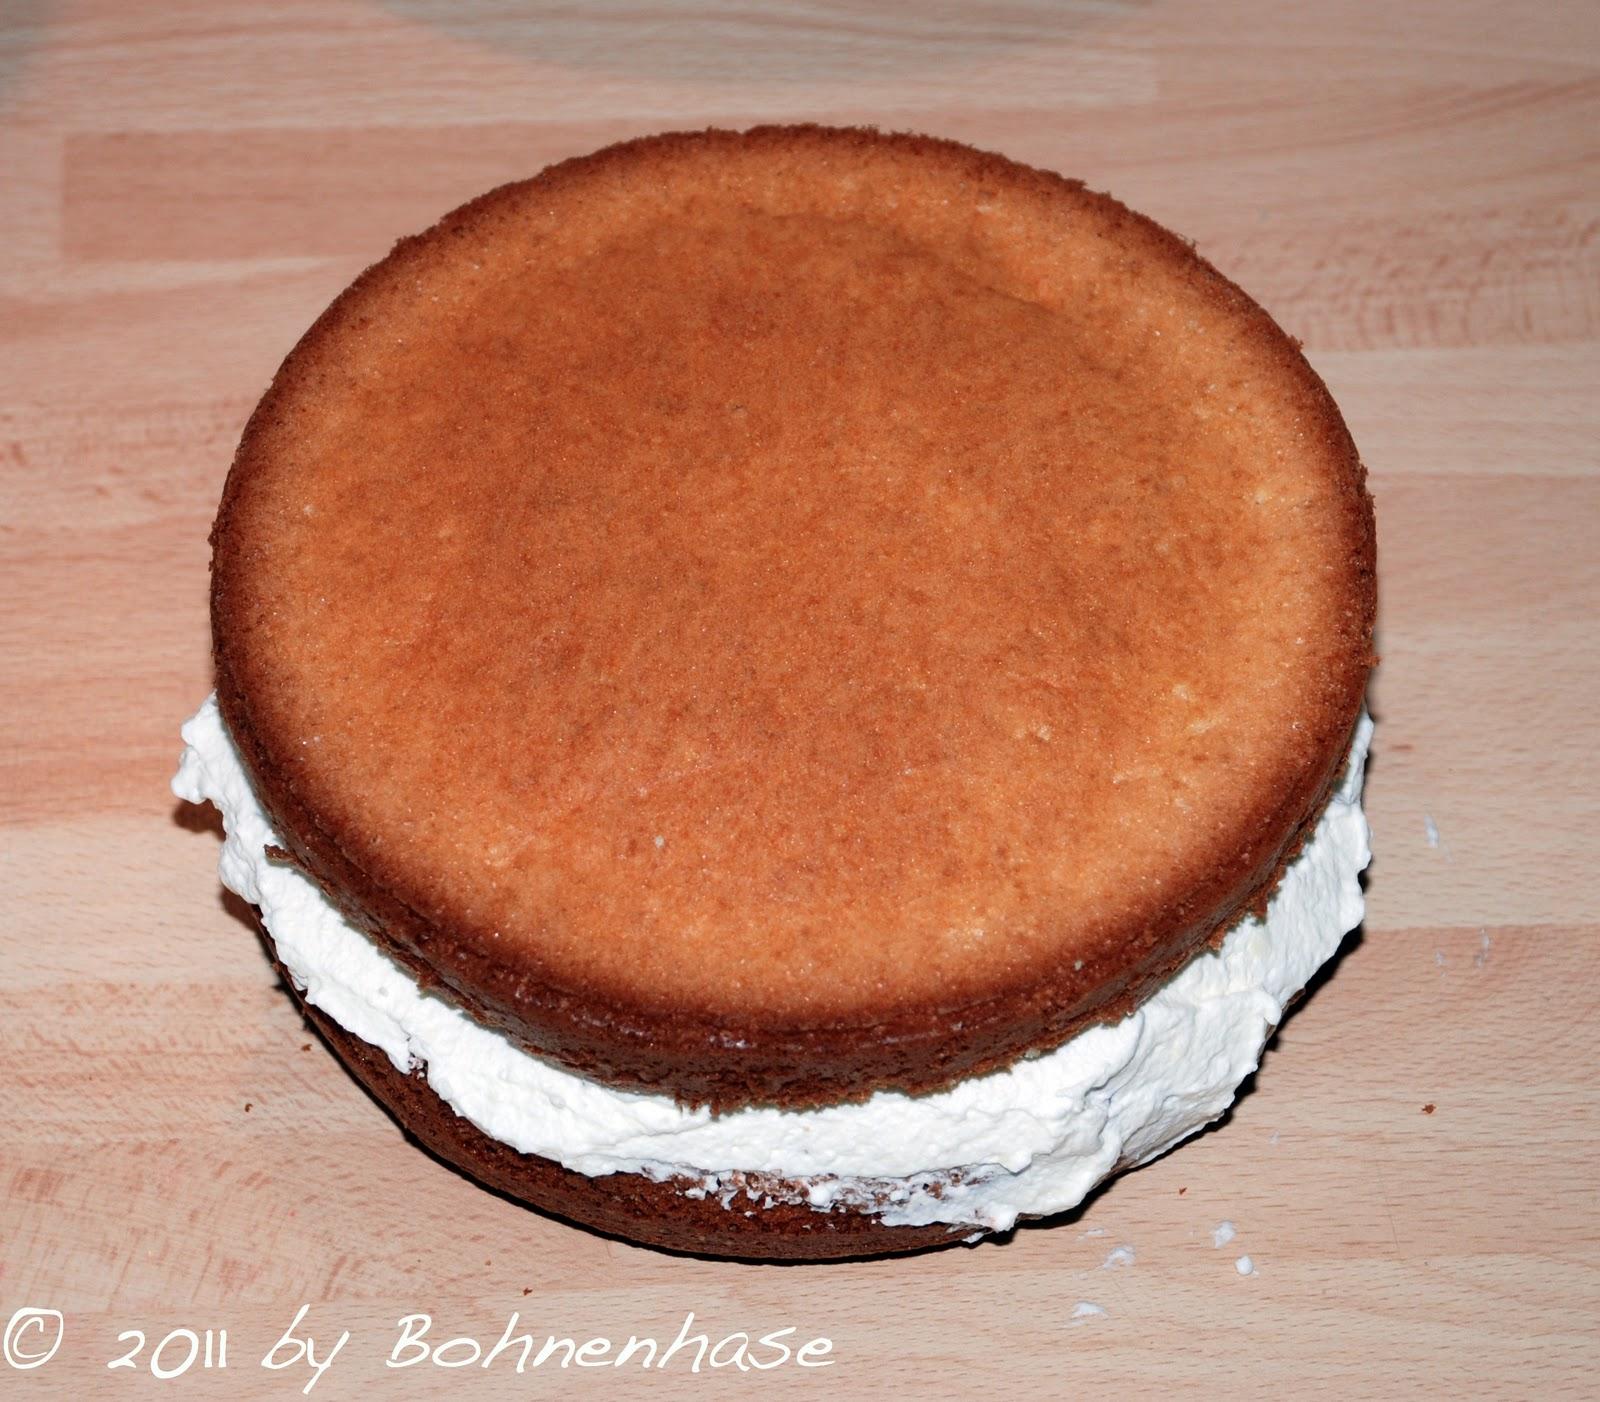 Bohnenhase bento: japanese christmas cake / クリスマスケーキ